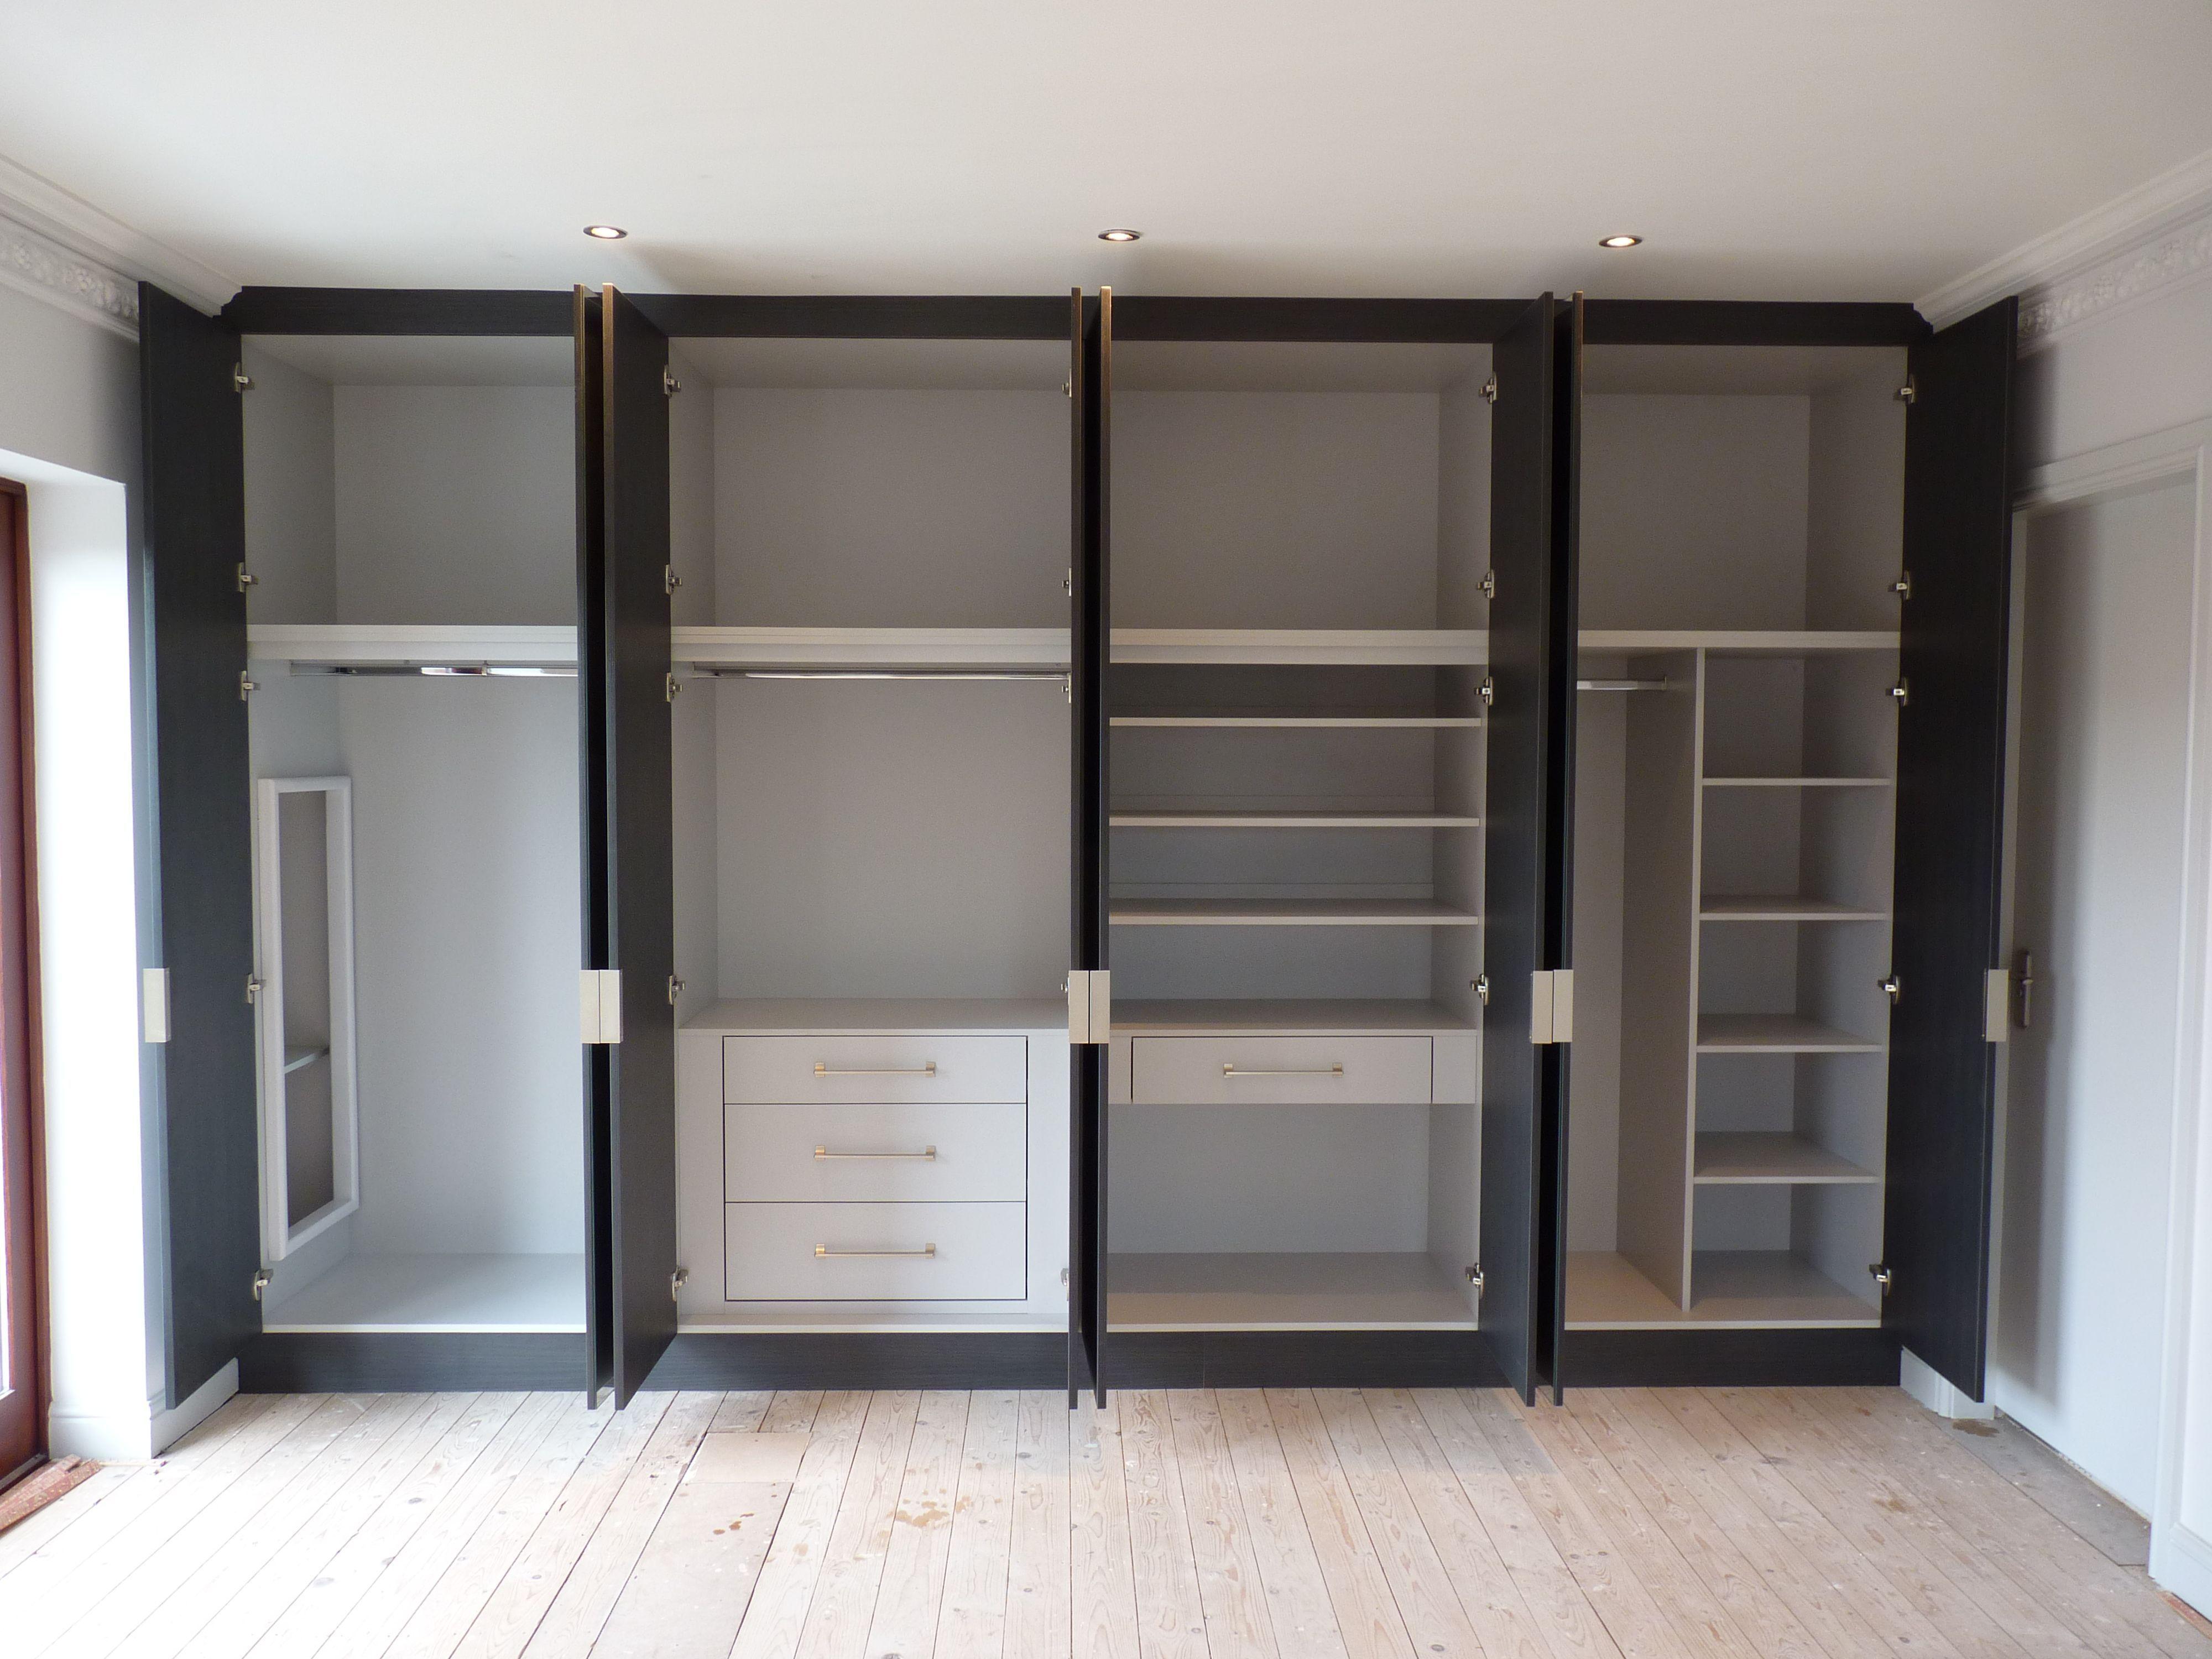 White gloss acrylic built in wardrobe with sliding door cabinet internal design also rh pinterest